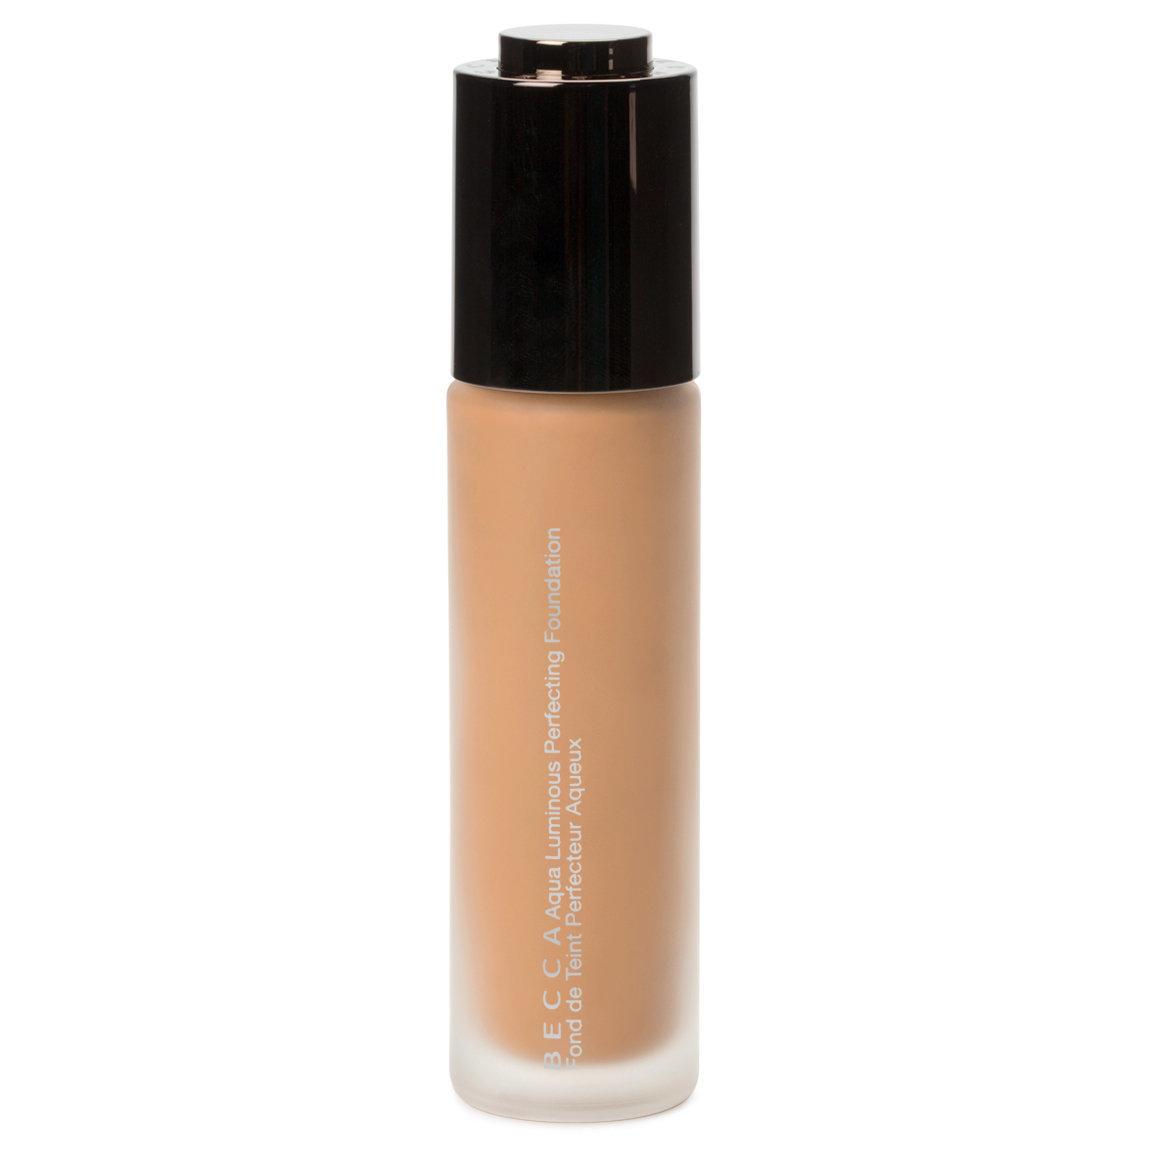 BECCA Cosmetics Aqua Luminous Perfecting Foundation Tan alternative view 1.